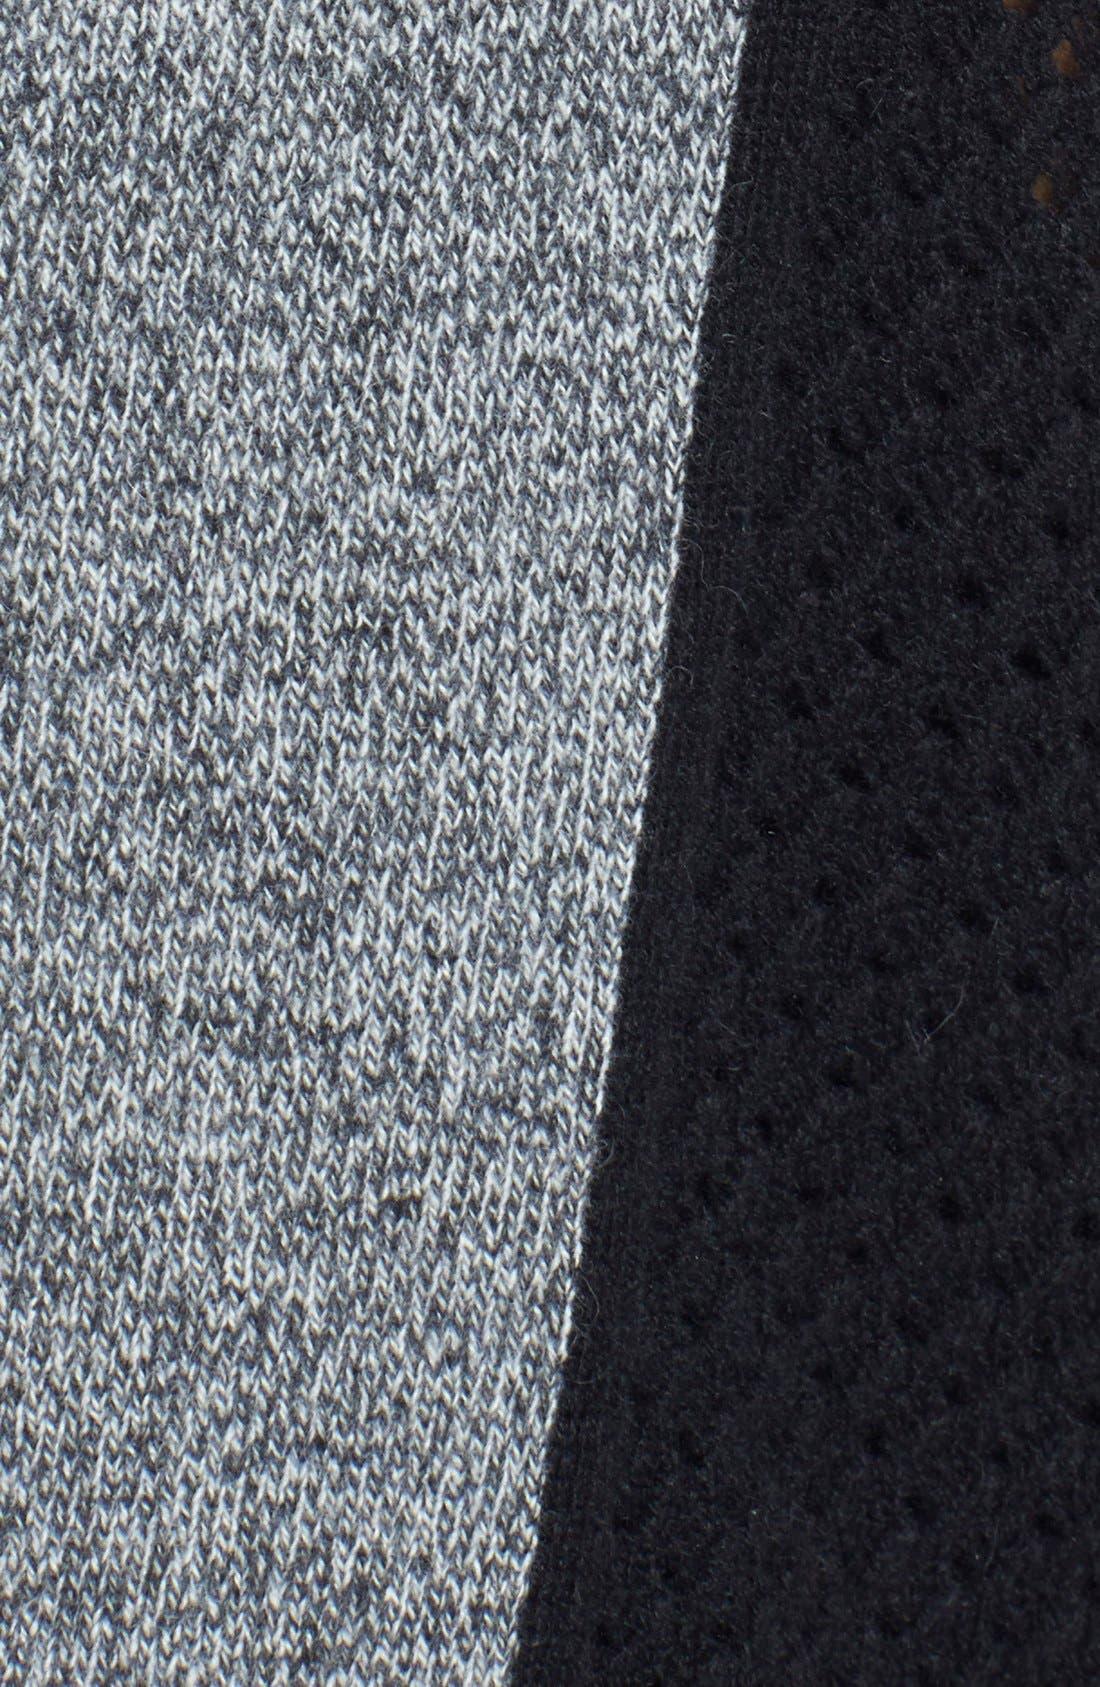 Colorblock Pointelle Cashmere Sweater,                             Alternate thumbnail 2, color,                             021